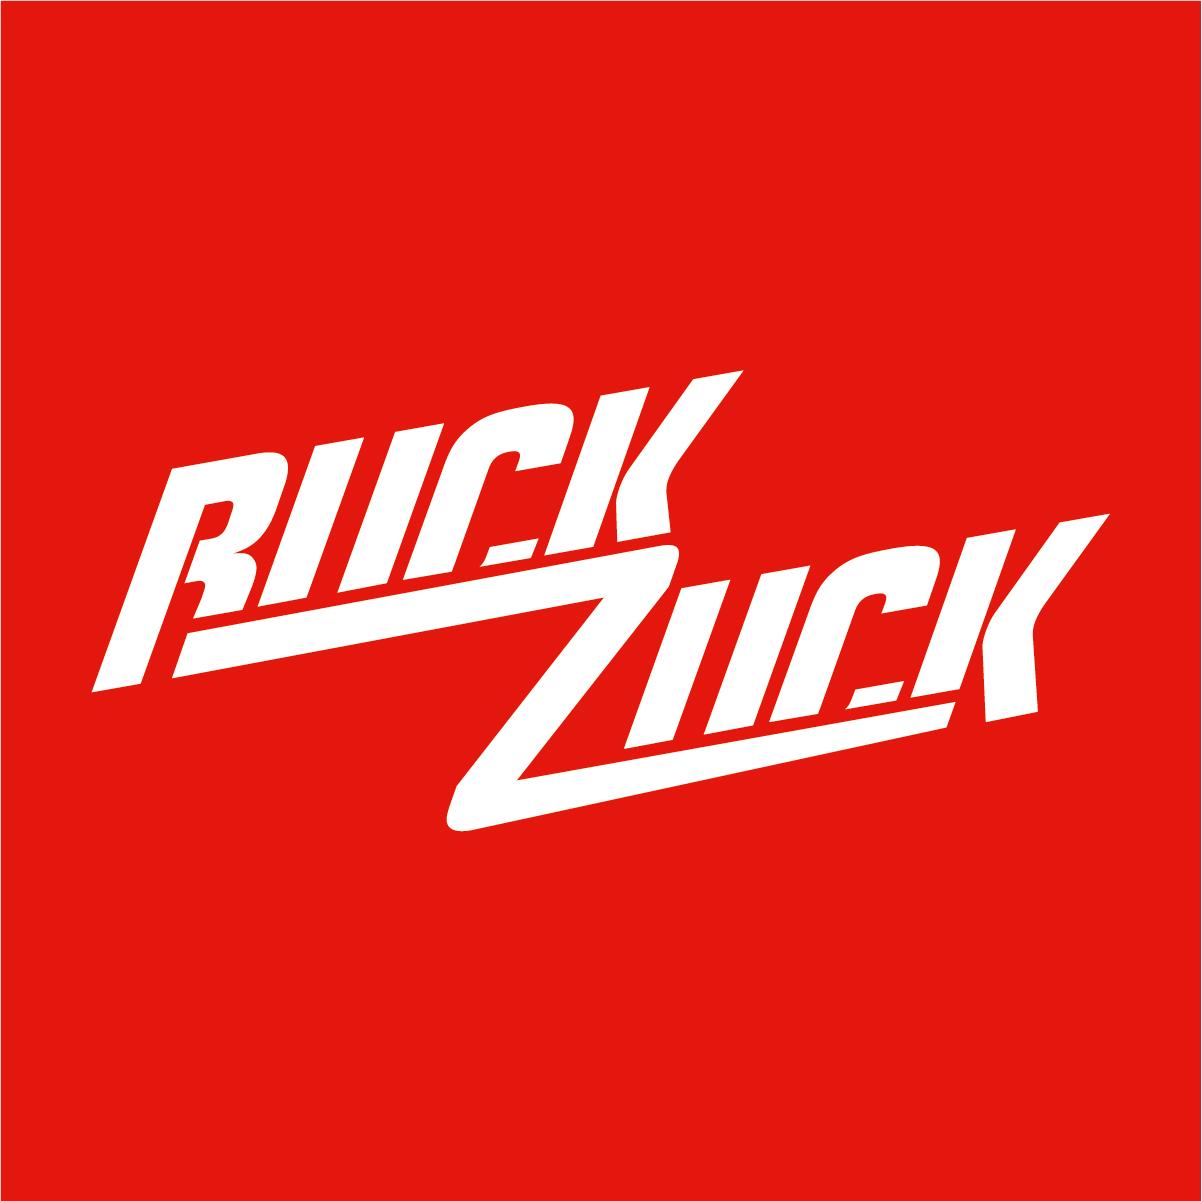 MUSTER NEO 2.0 Designboden 4,5mm Silvergrey Concrete PVC-frei Fliese 4V-Fuge